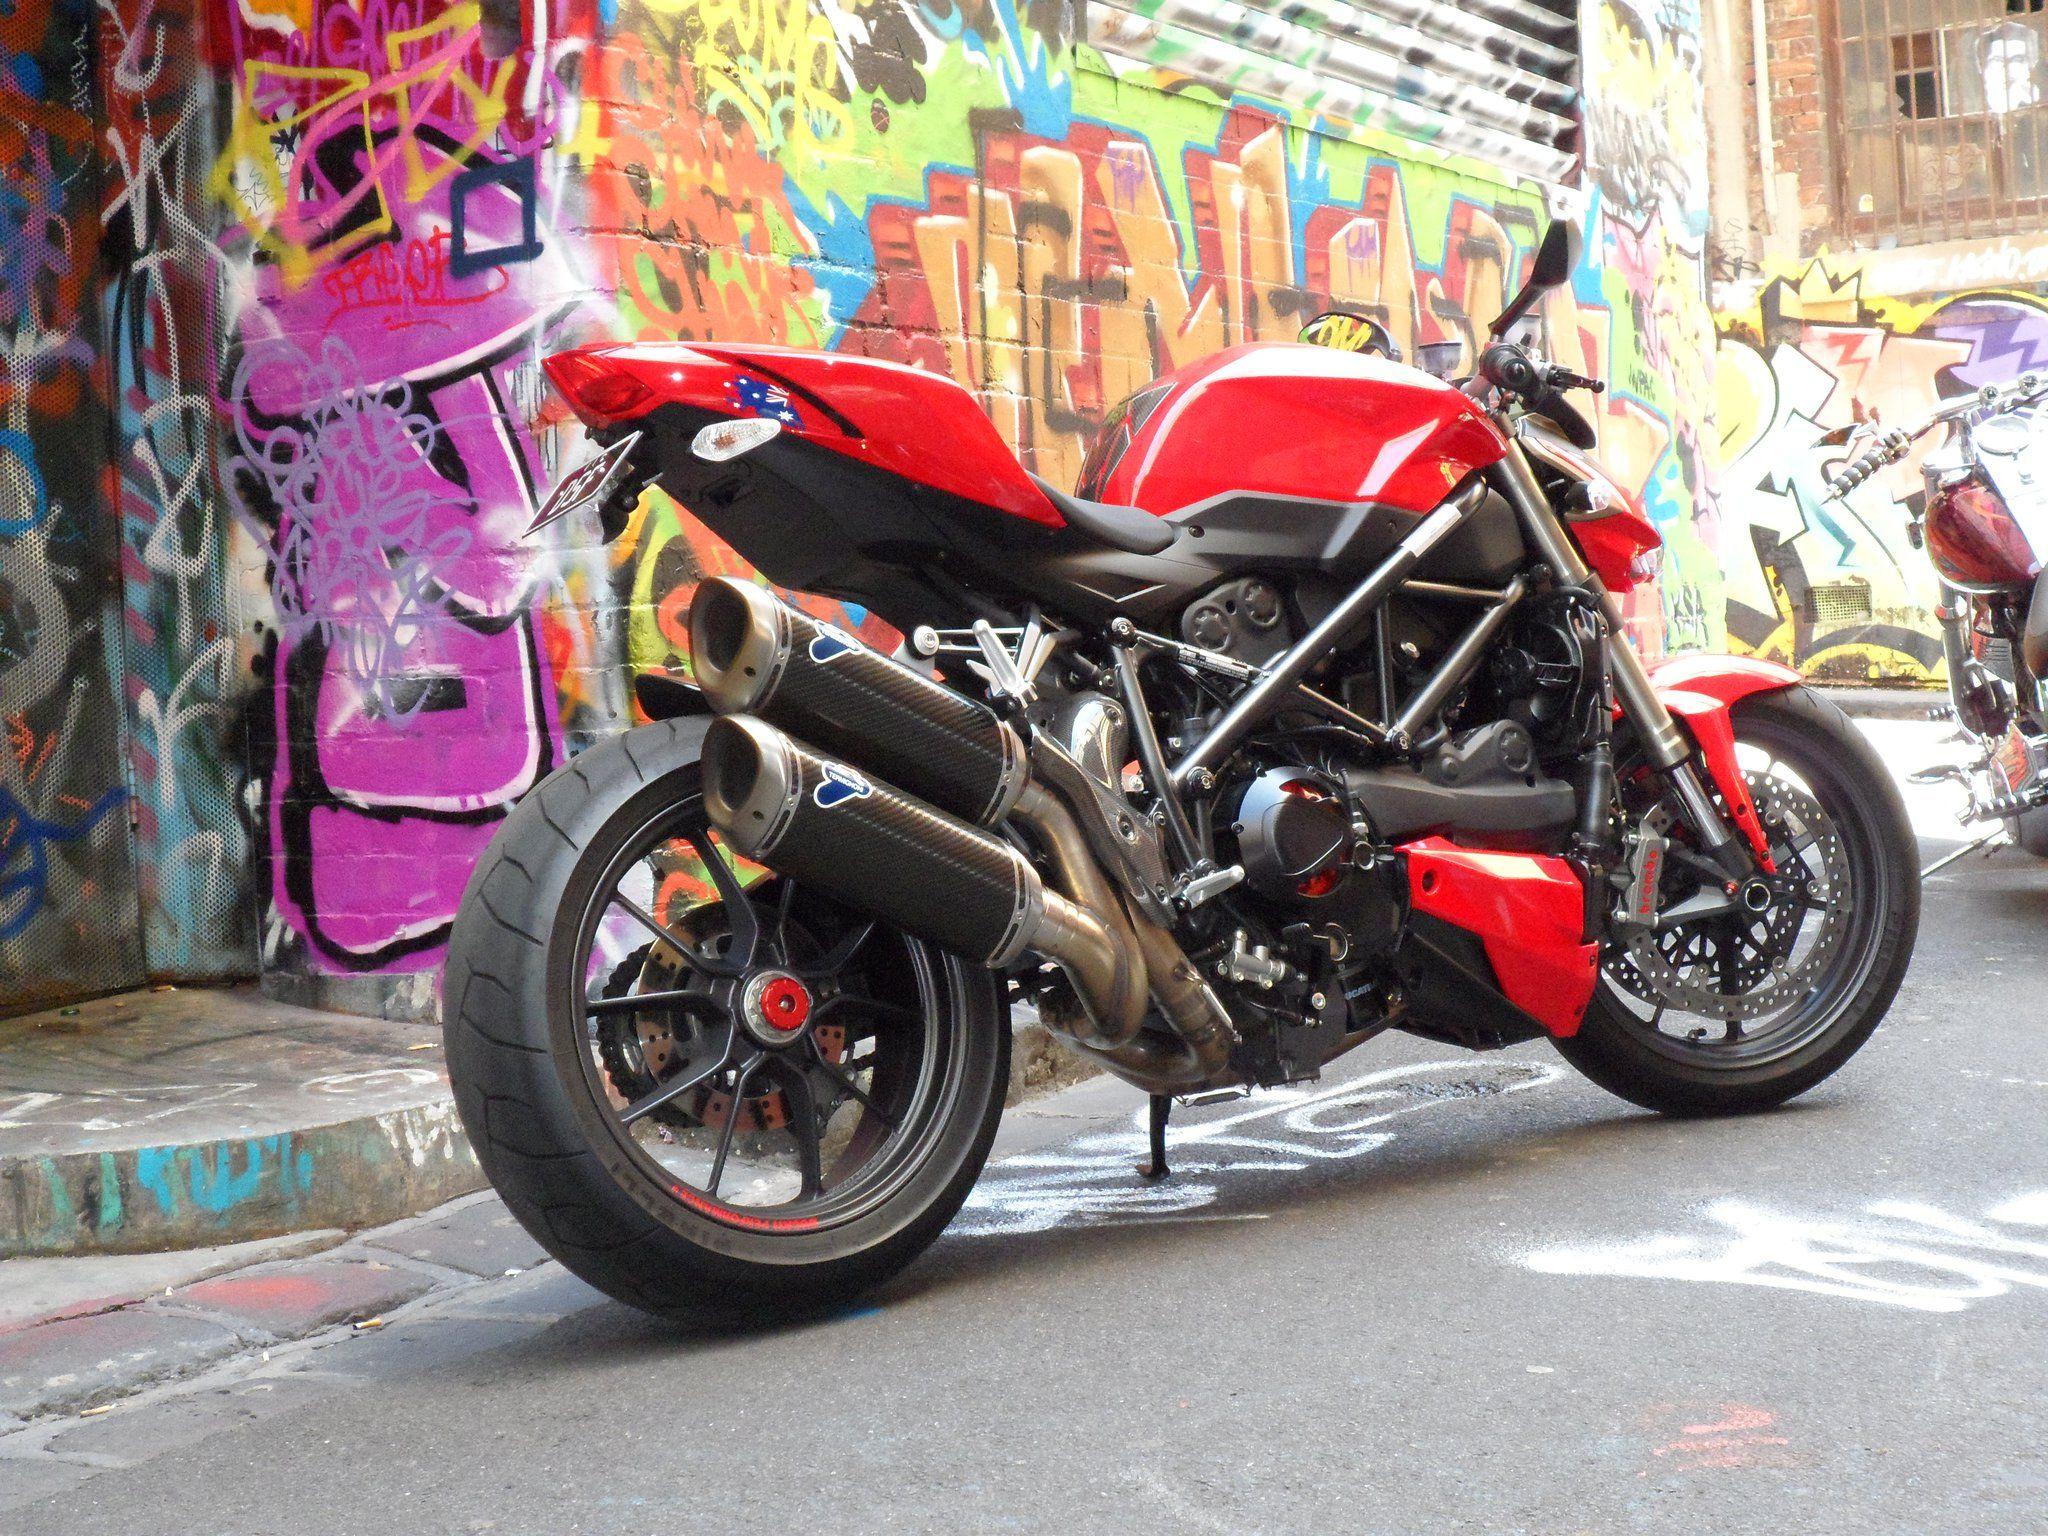 Ride Review: Ducati Streetfighter 848 - Asphalt & Rubber